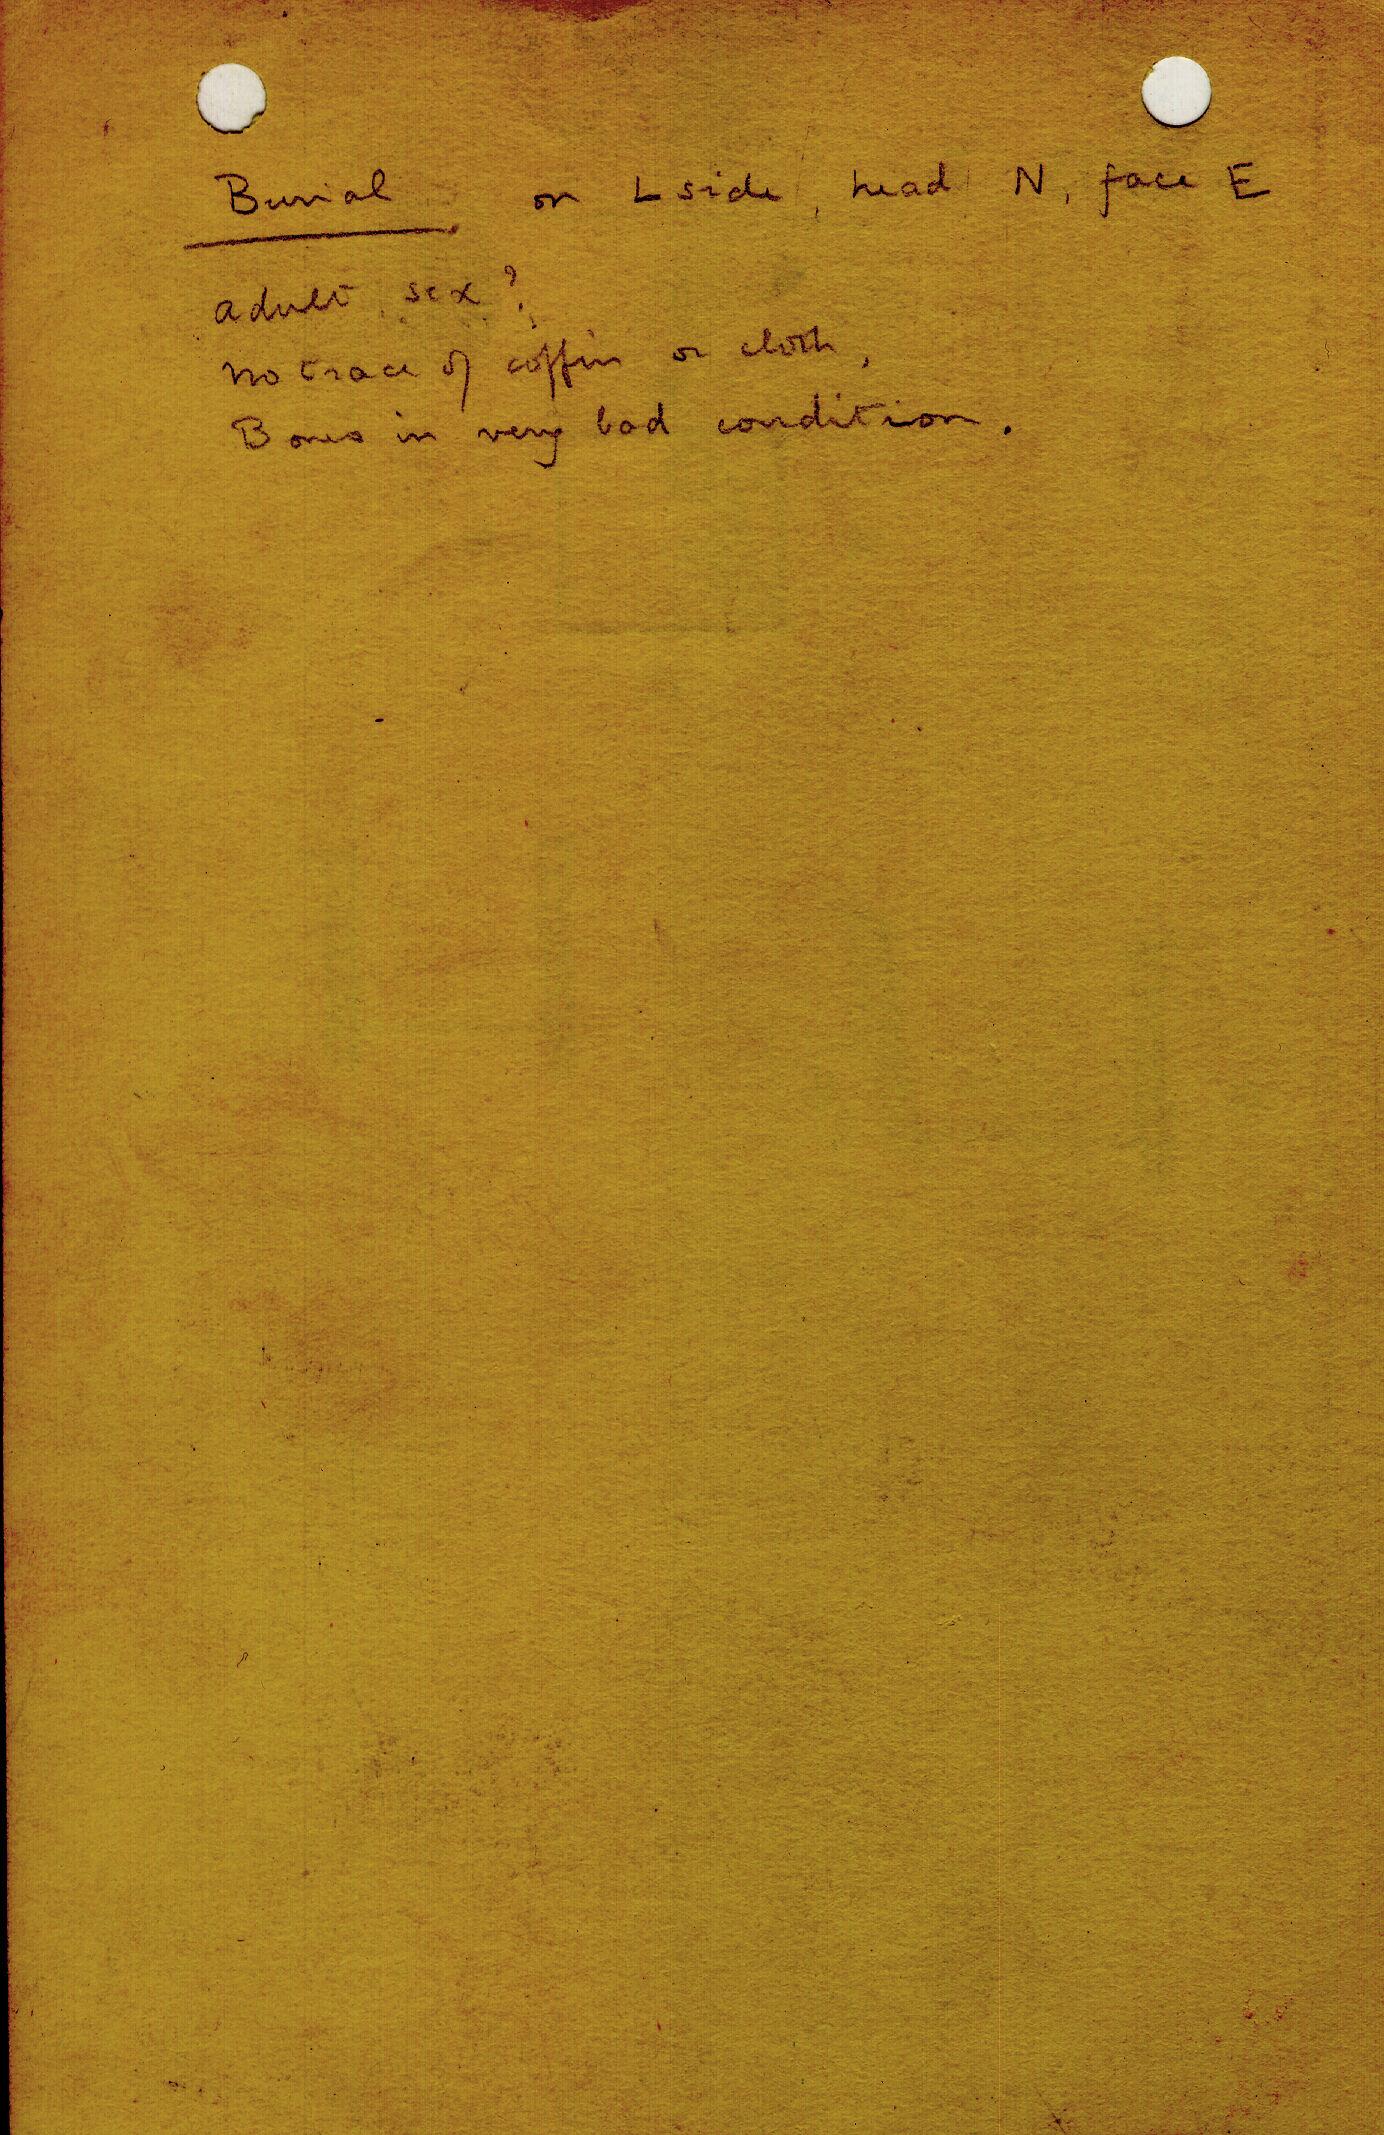 Notes: G 1303, Shaft I, notes